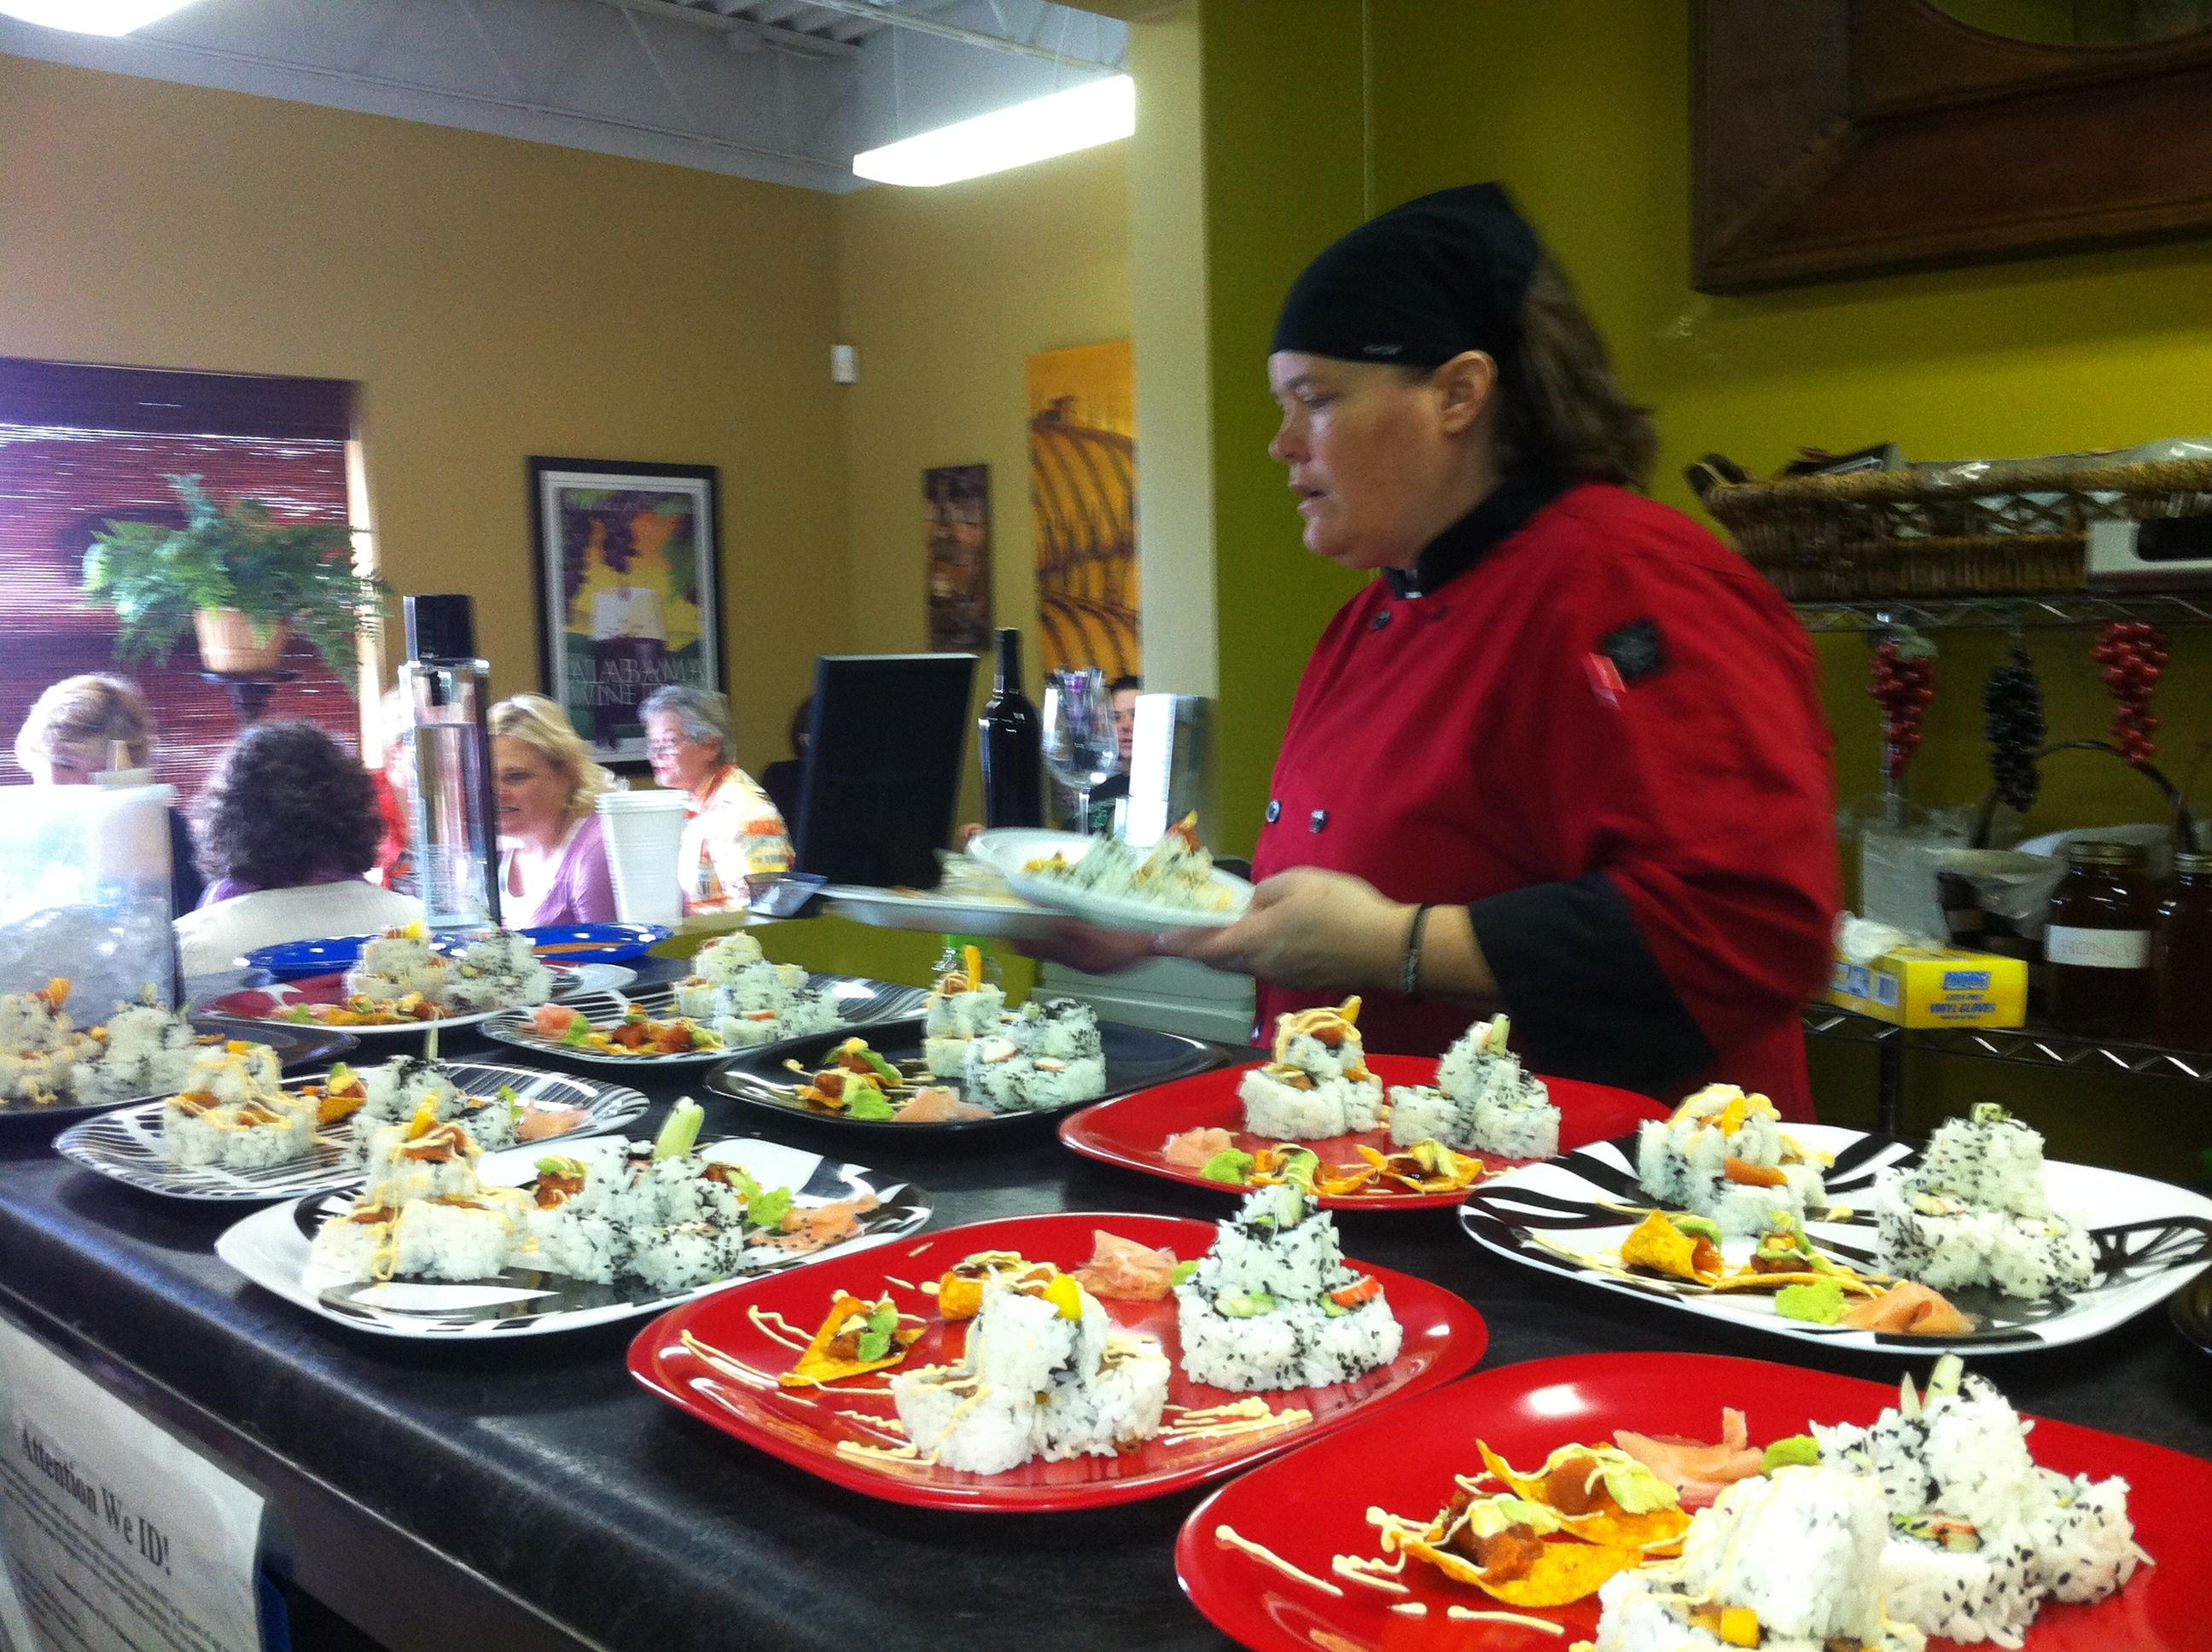 Local chef teaches sushi making in Birmingham